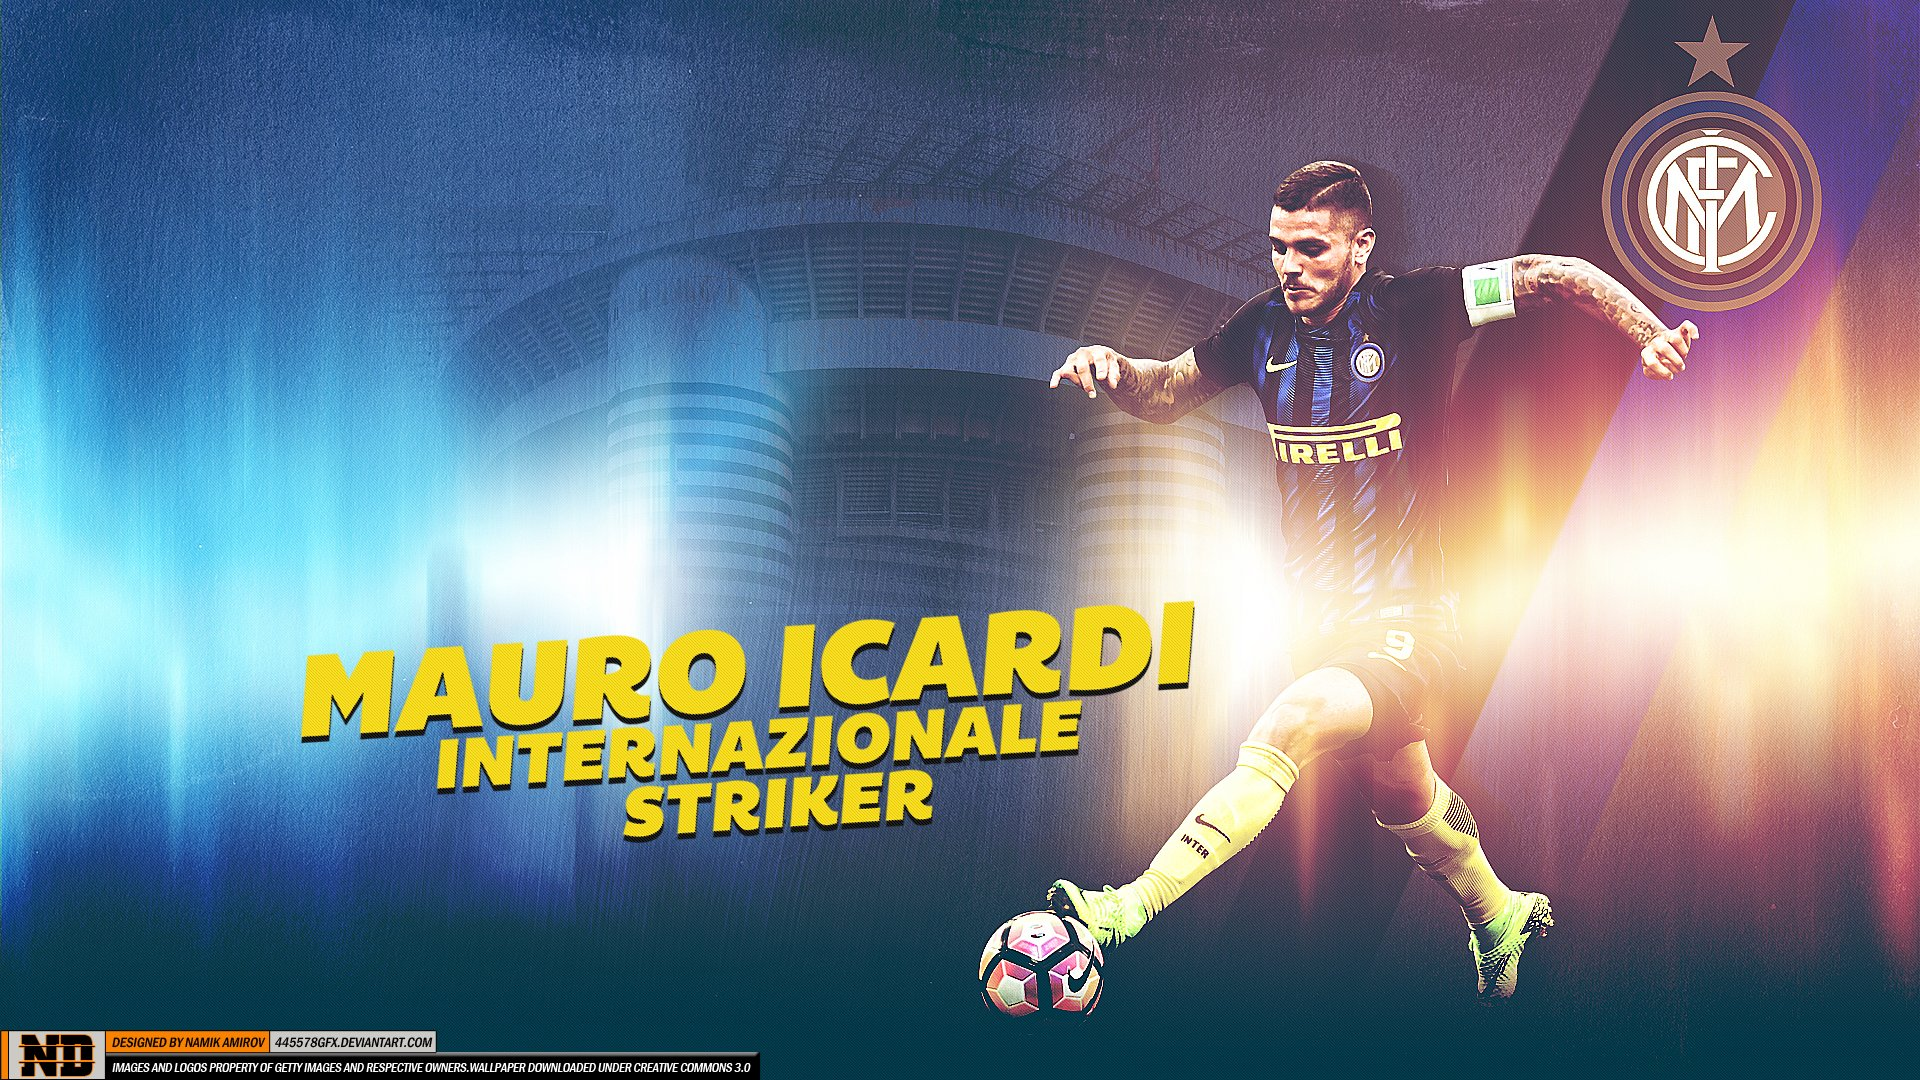 Mauro Icardi   Inter HD Wallpaper Background Image 1920x1080 1920x1080